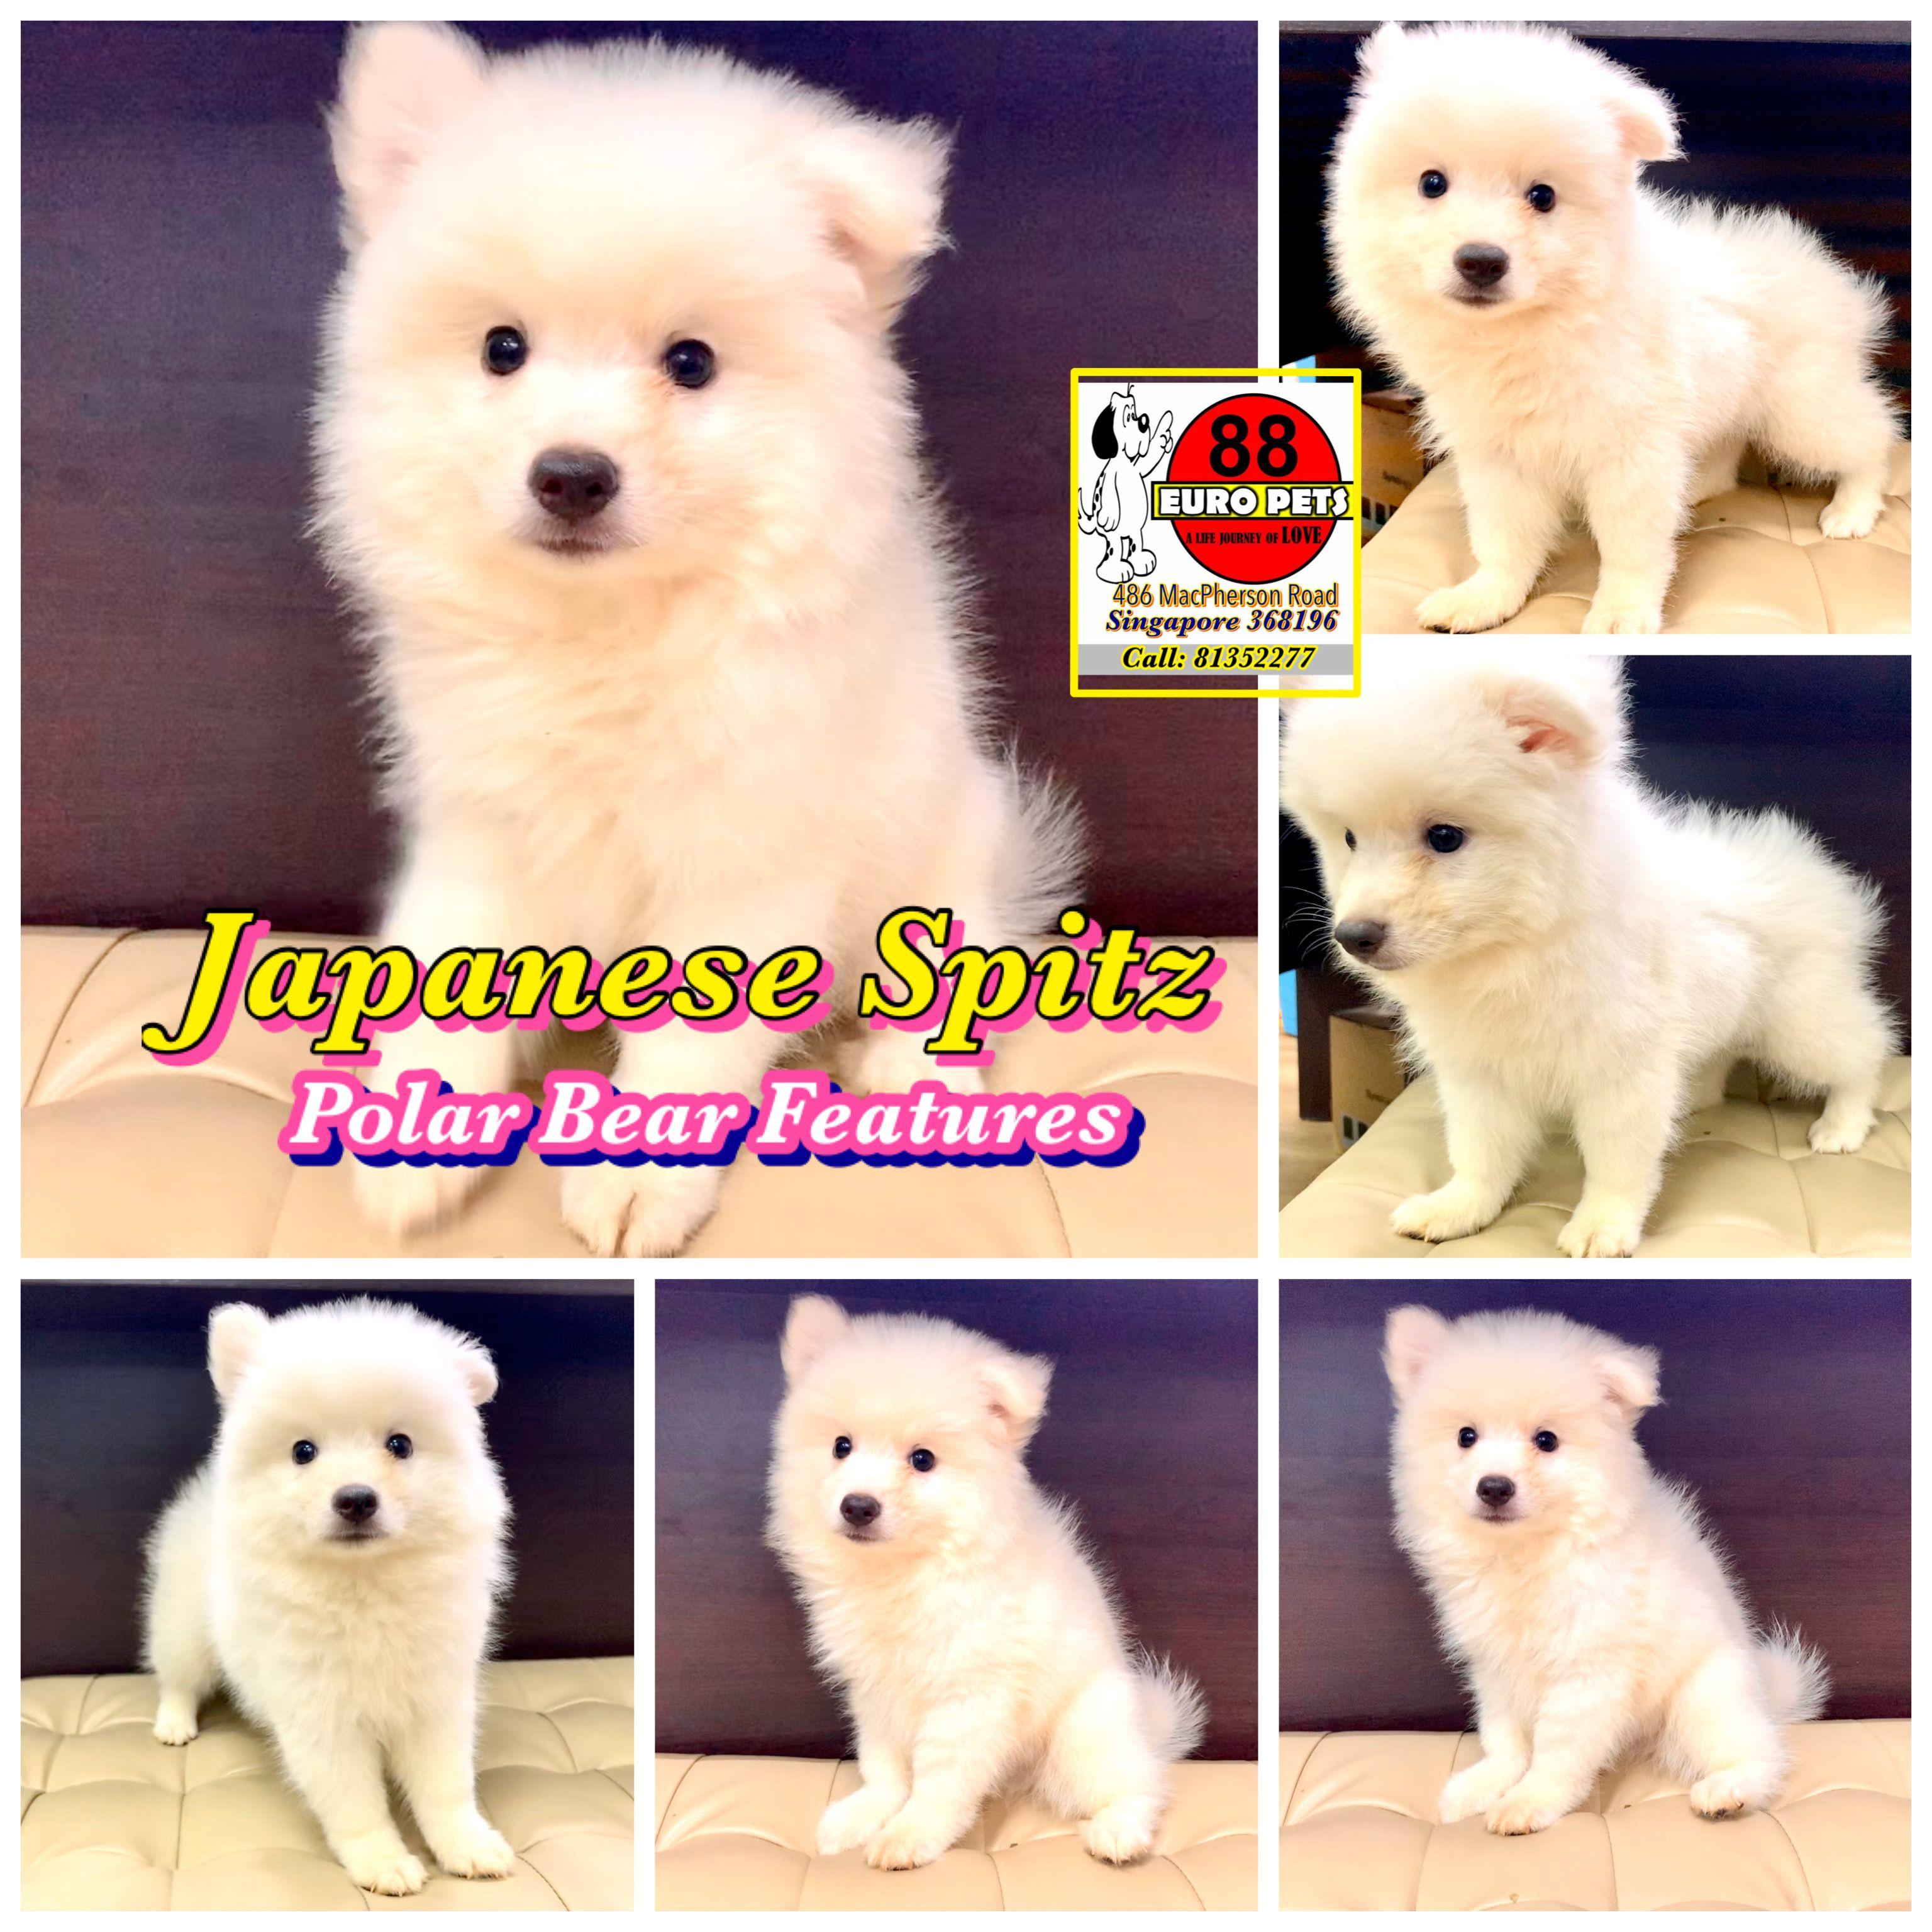 Japanese Spitz Puppies Singapore Japanese Spitz Puppy Japanese Spitz Puppies For Sale